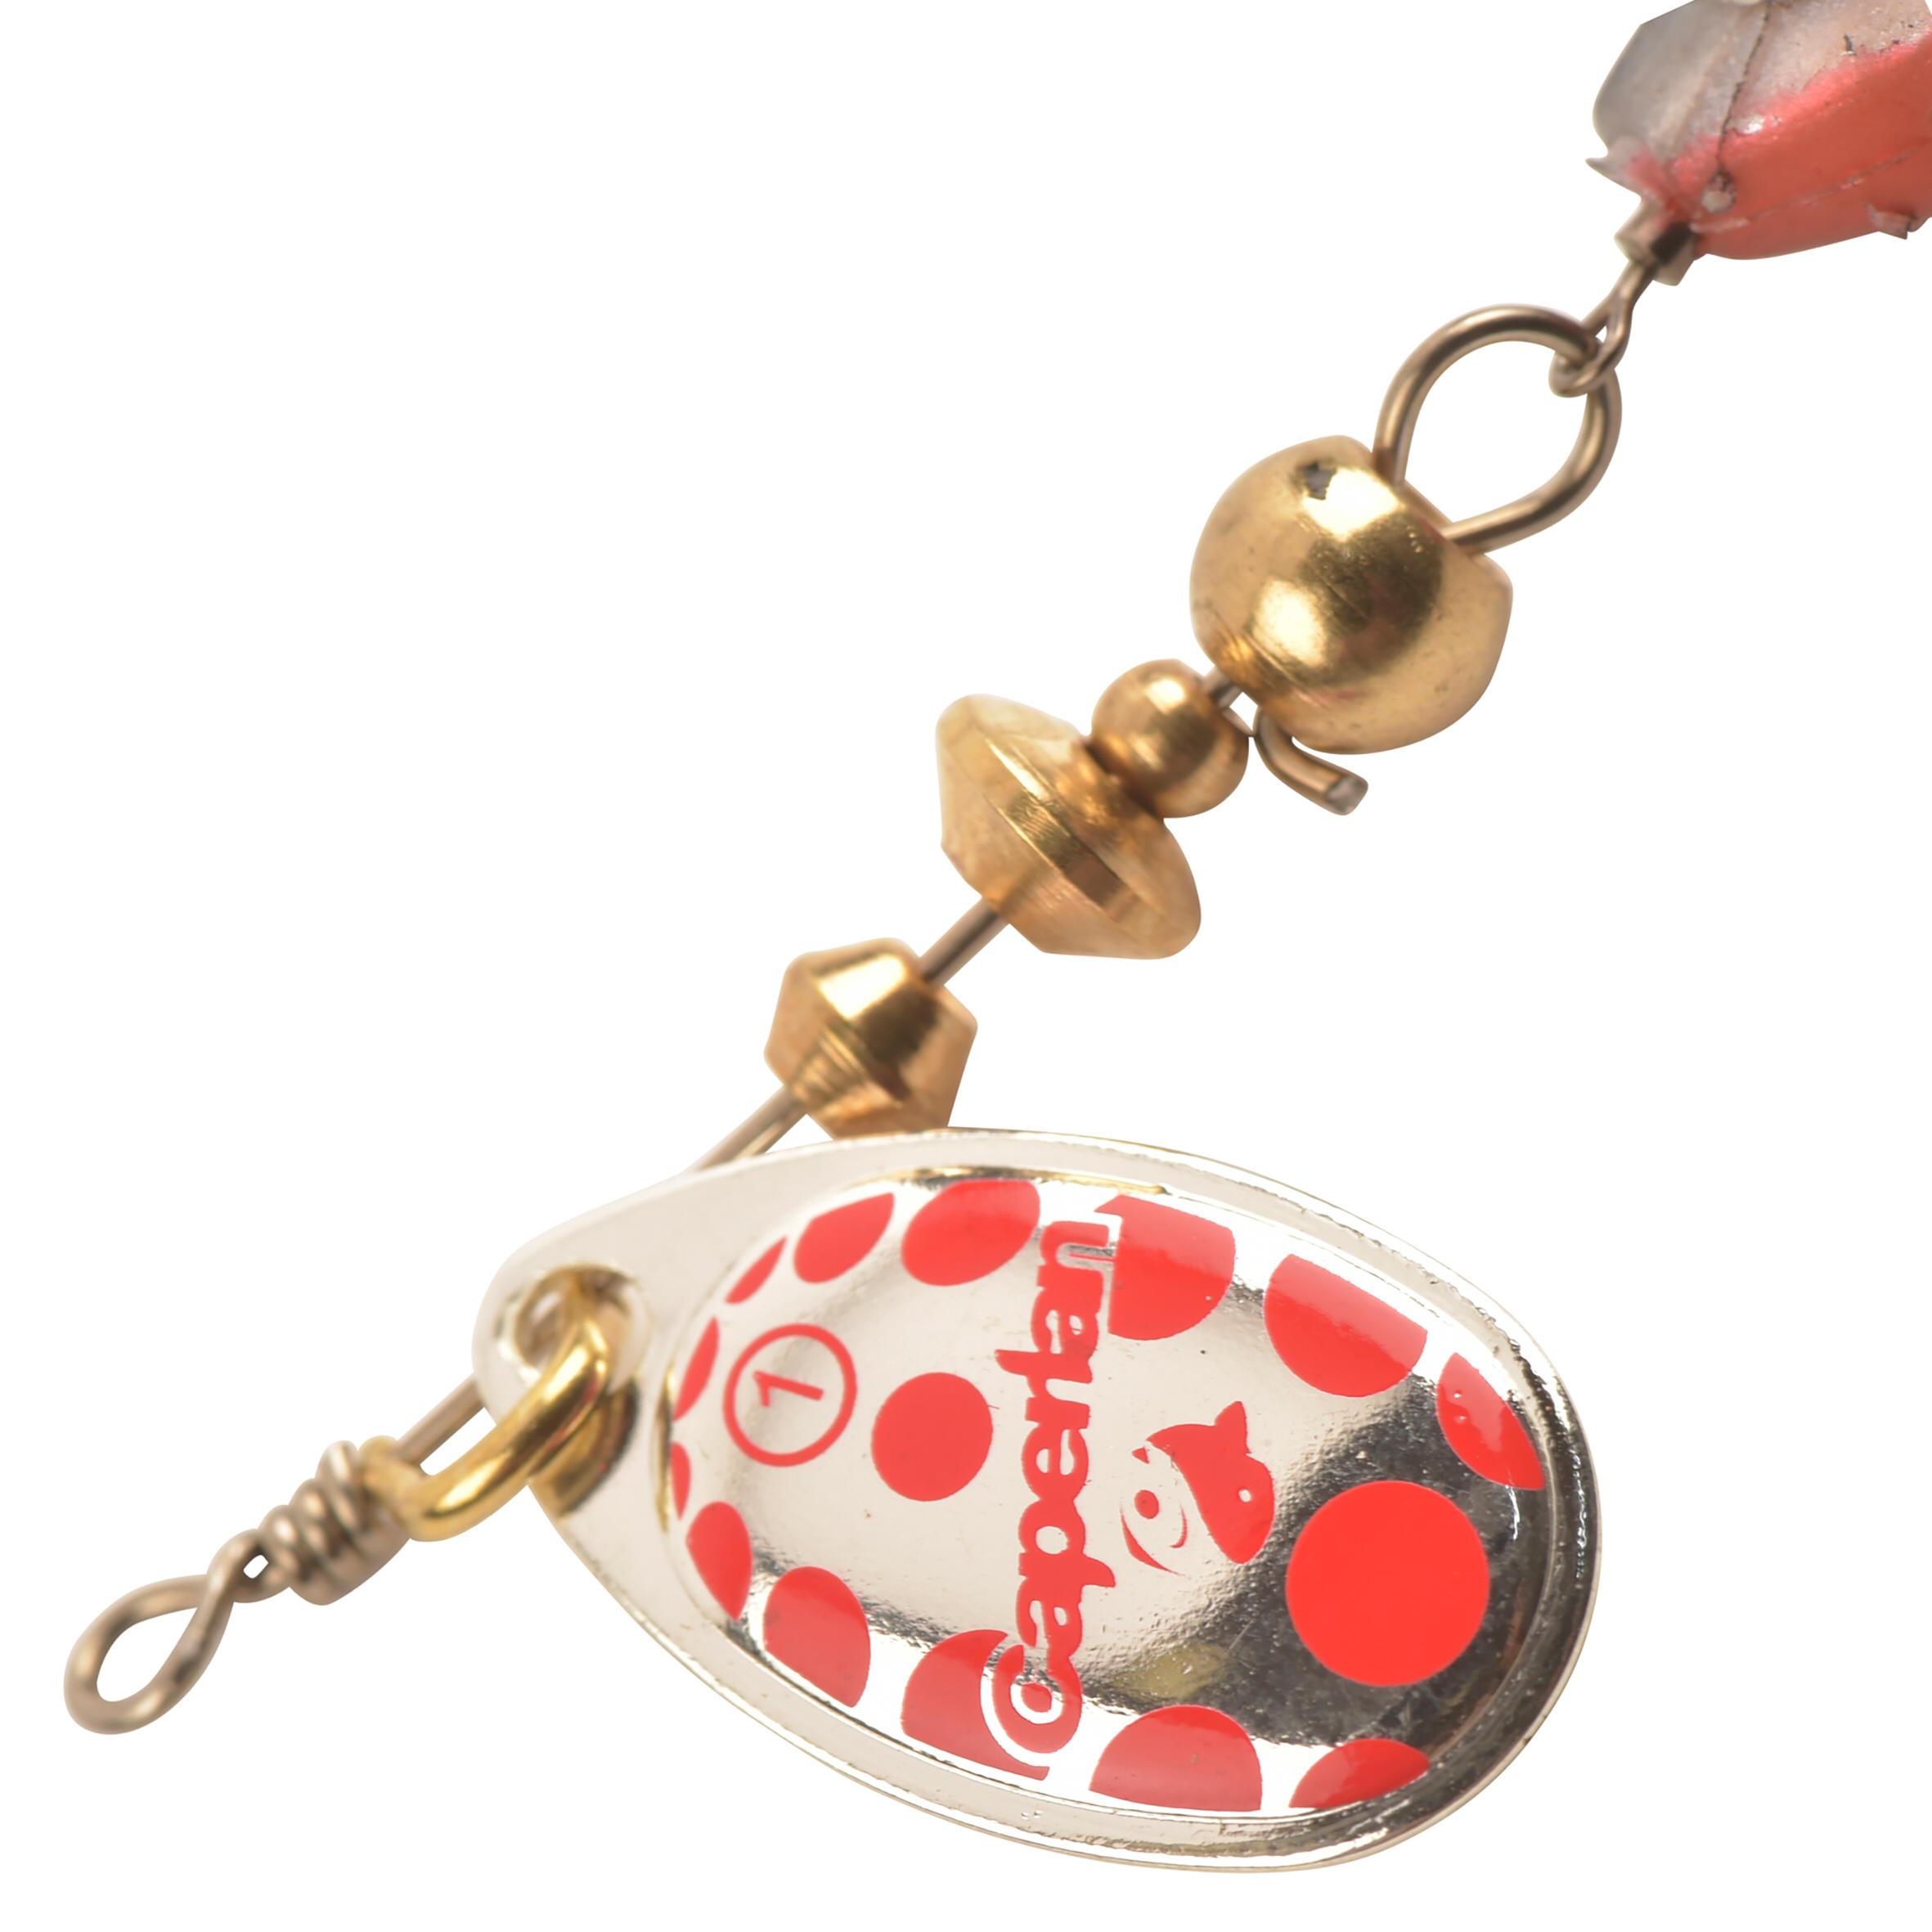 lepel hengelsport Spino #1 rood - 449569